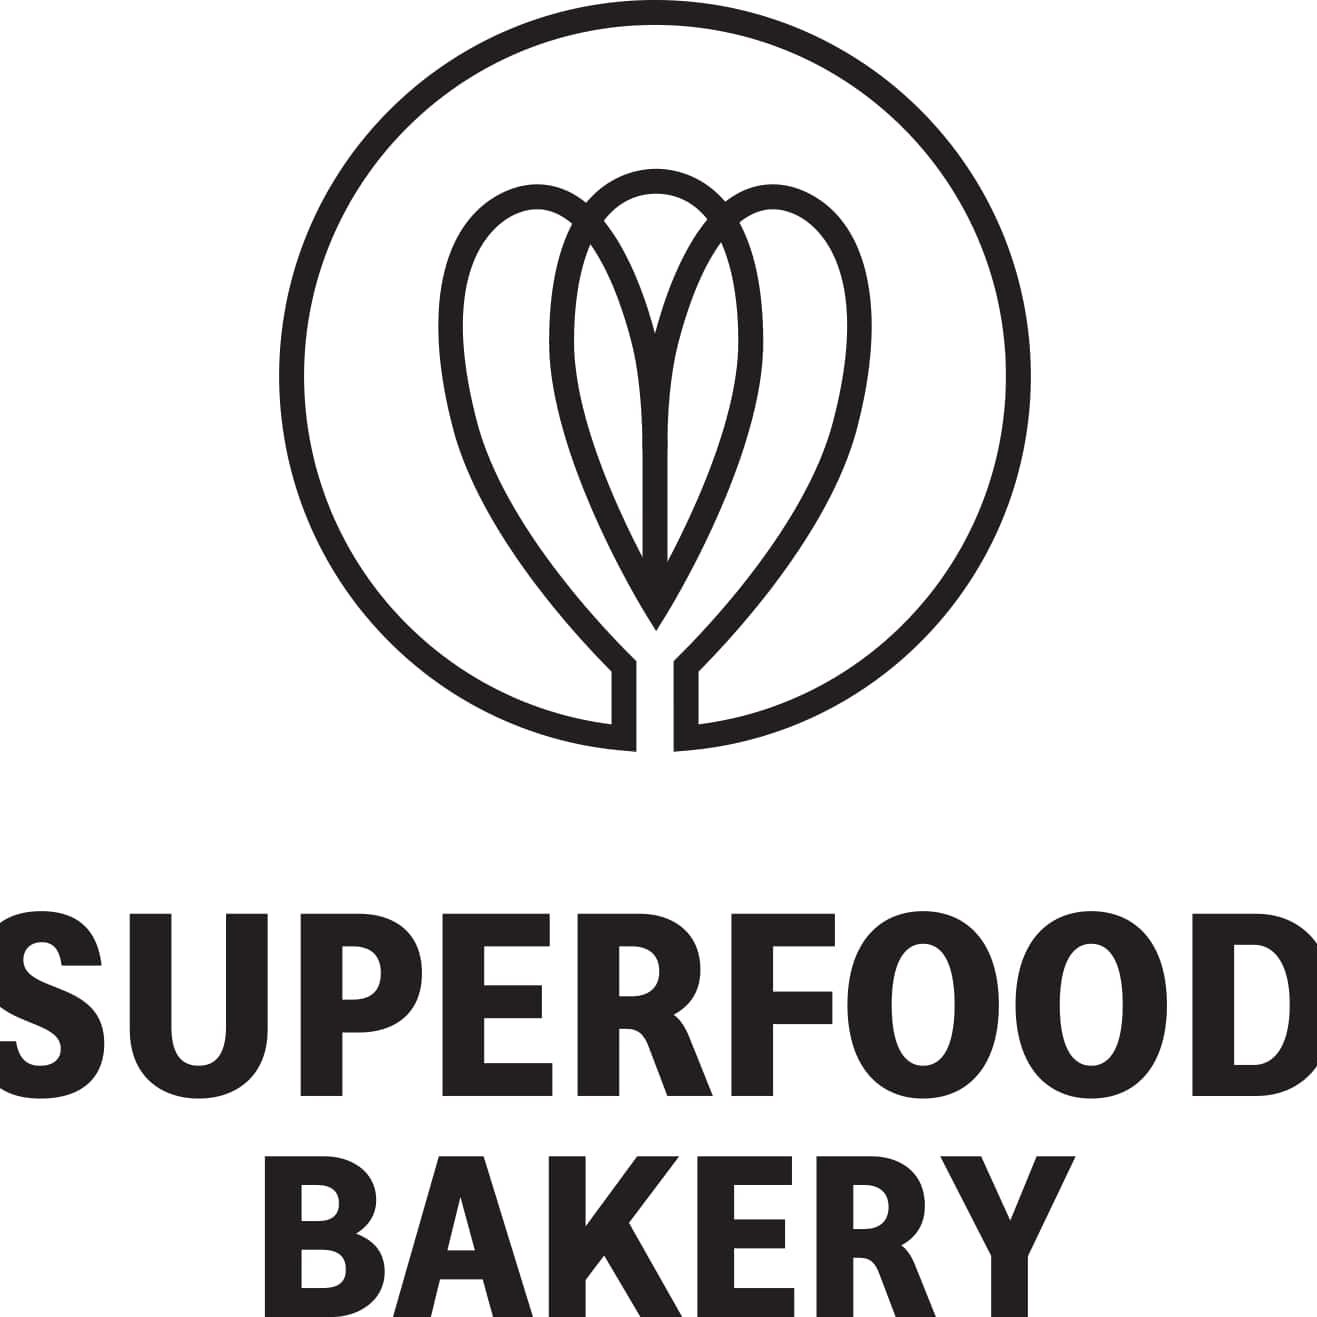 Superfood Bakery